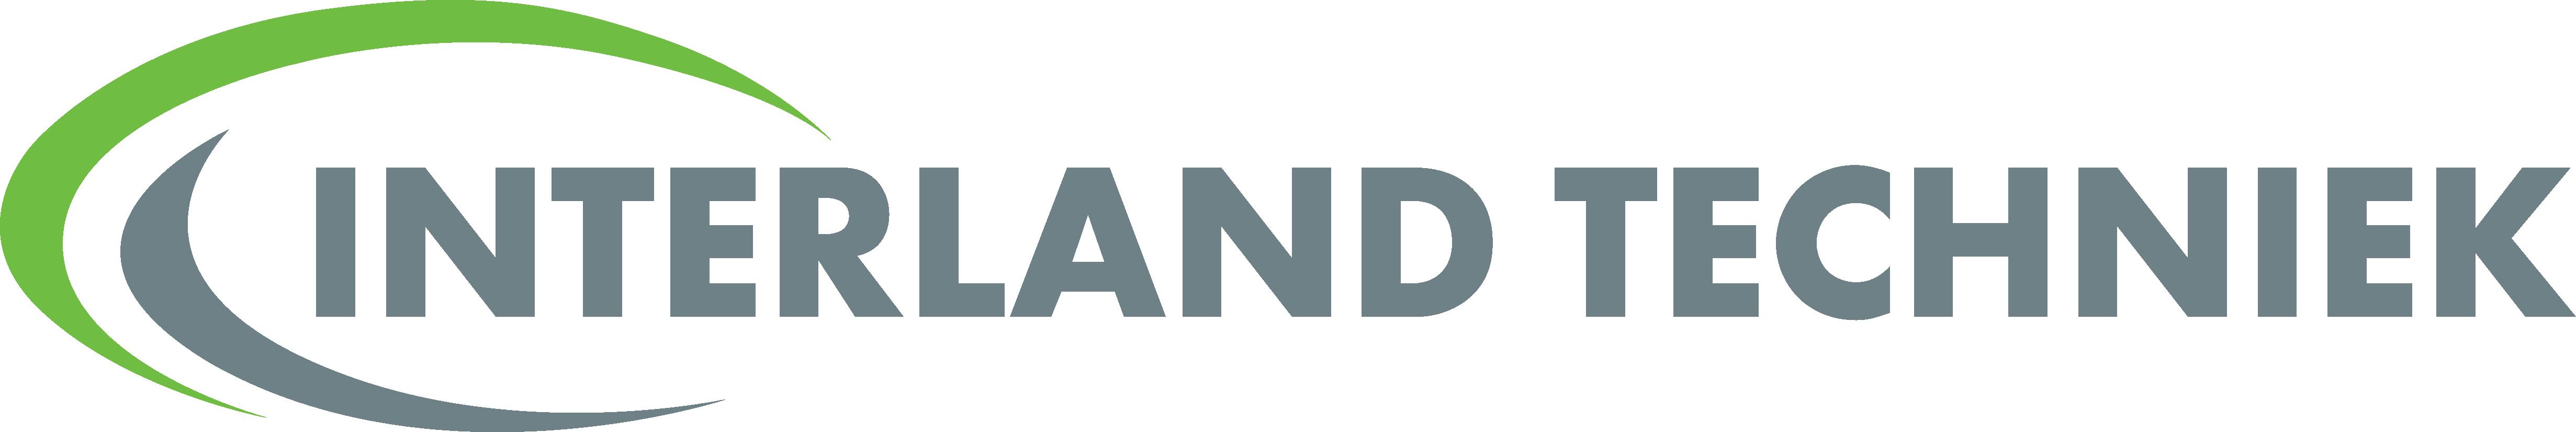 Interland Techniek